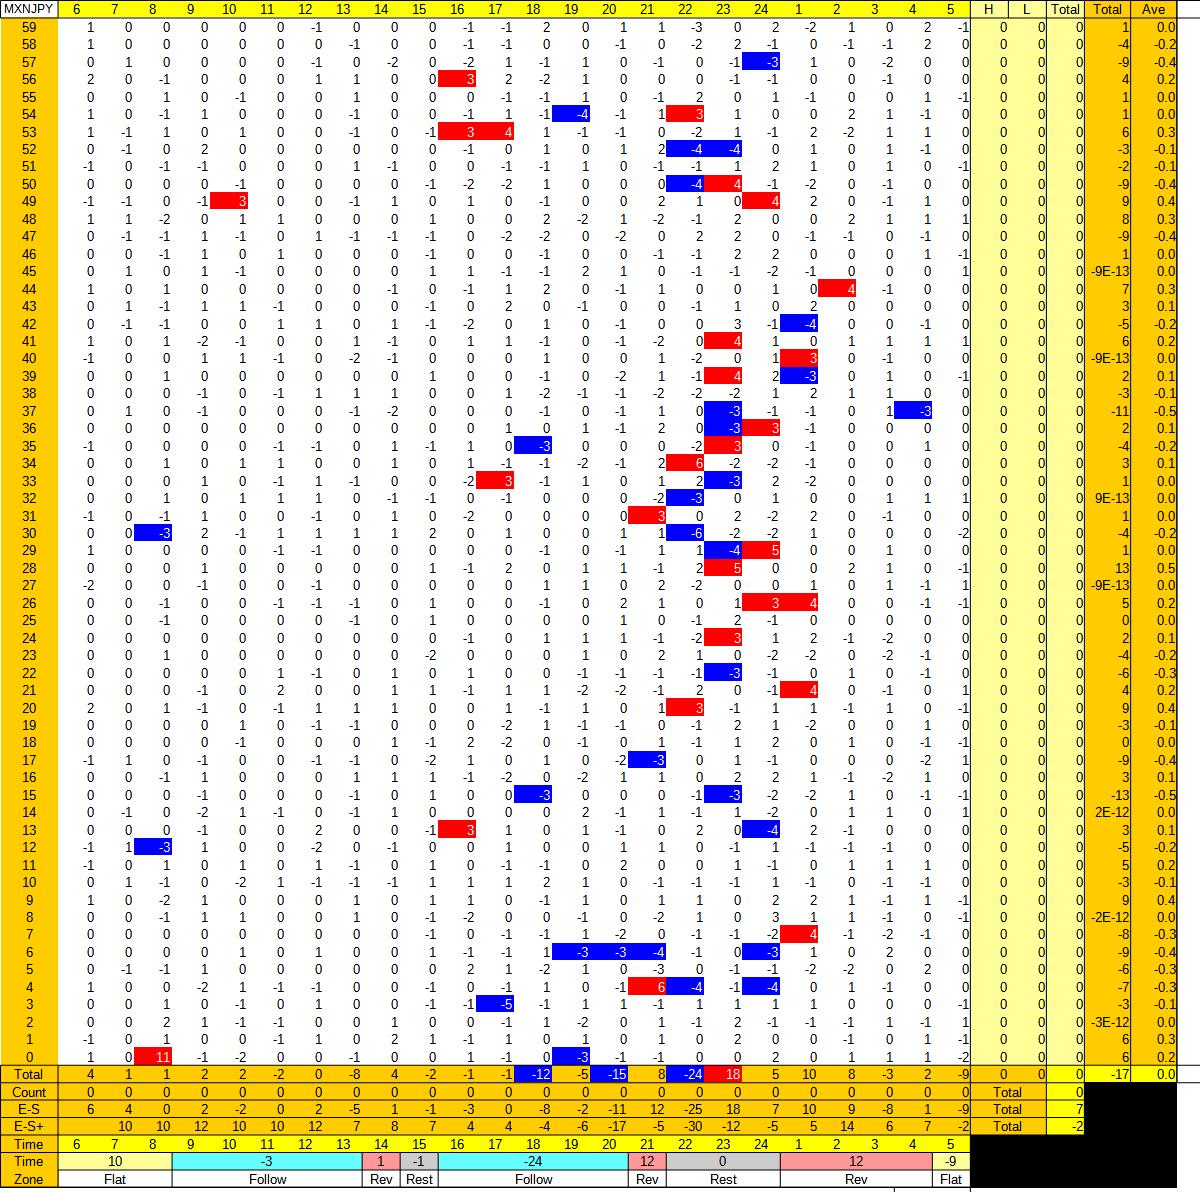 20210217_HS(3)MXNJPY